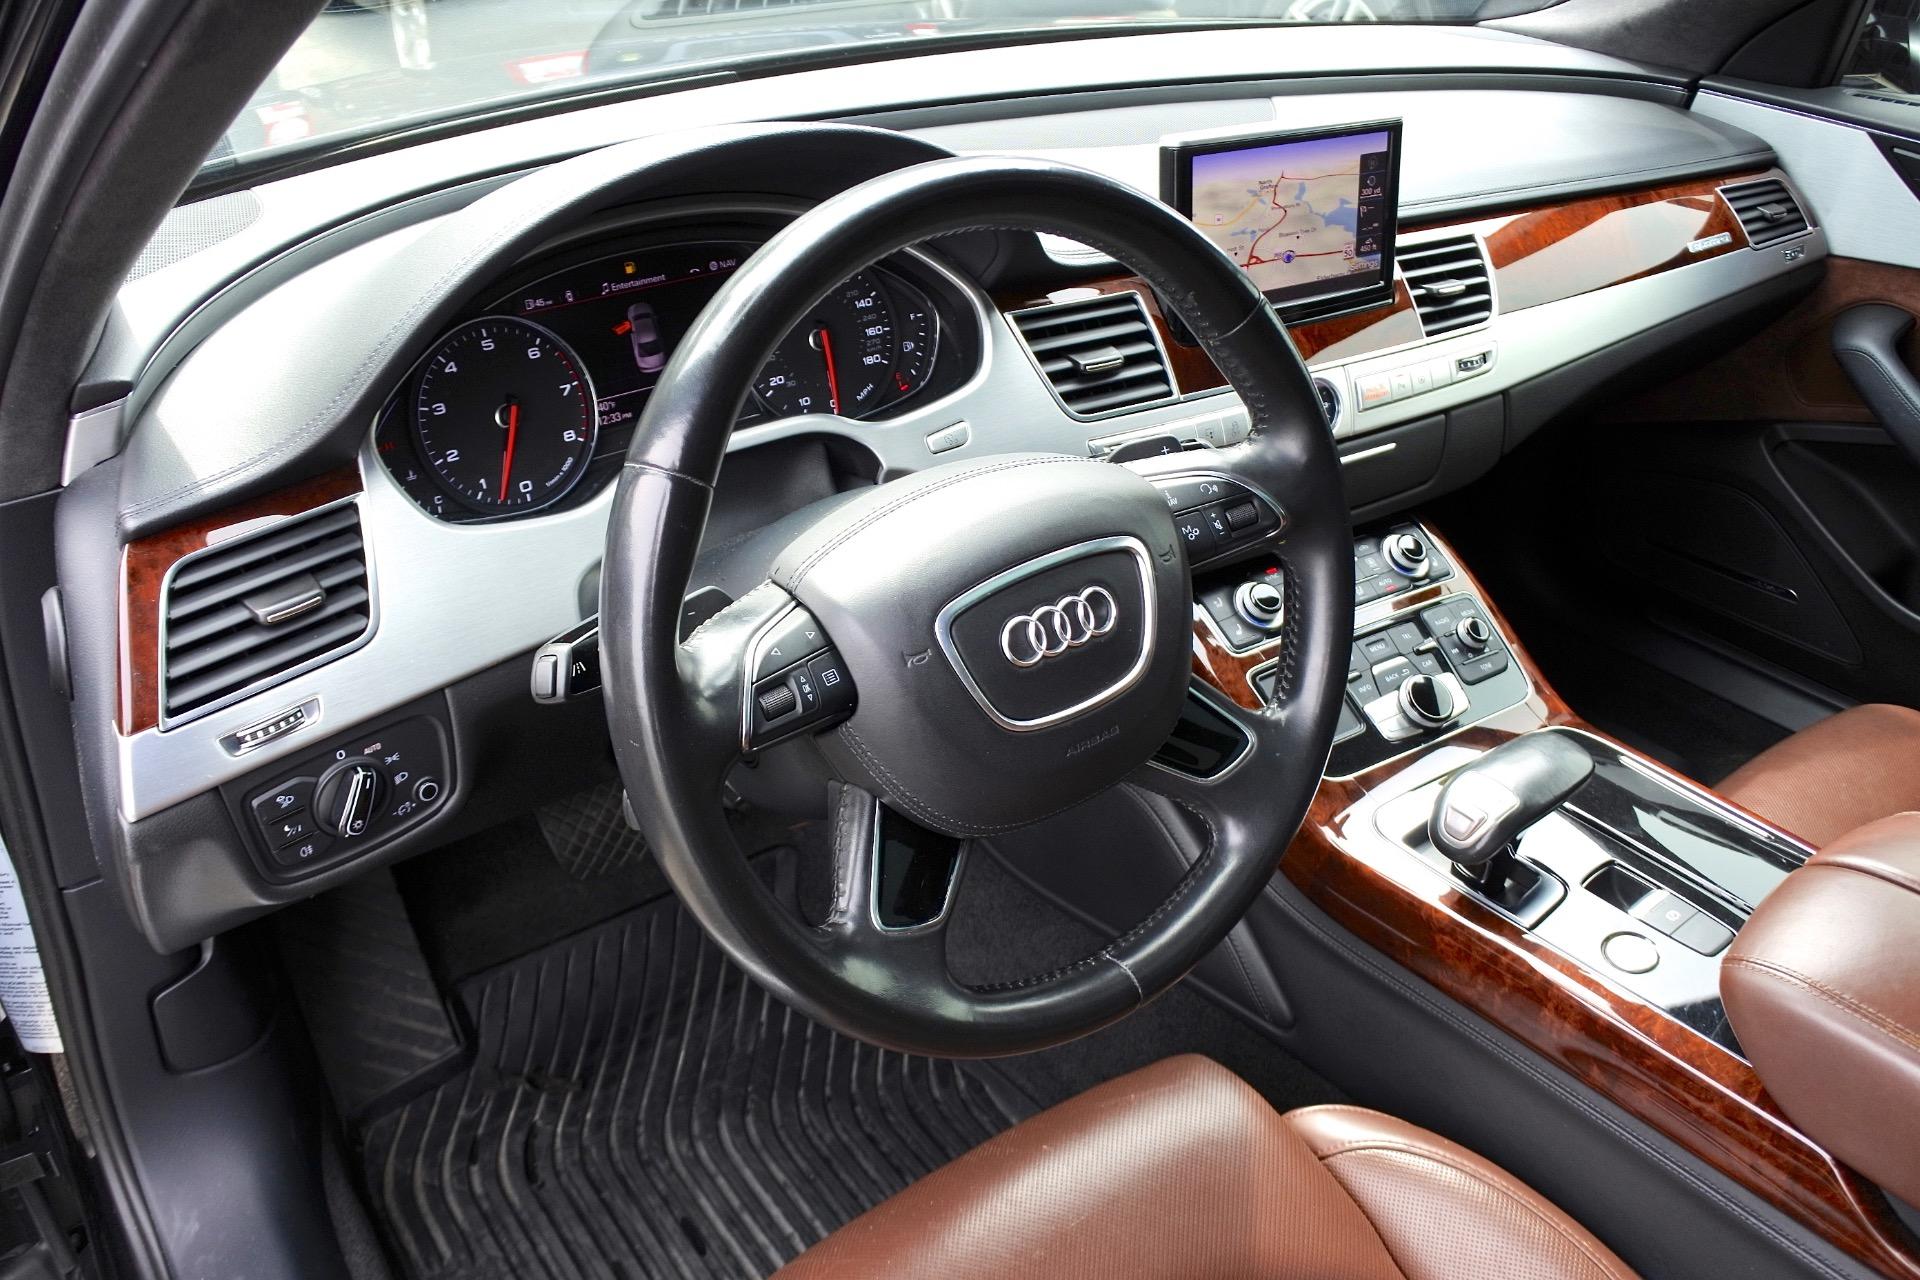 Used 2012 Audi A8 l W12 Quattro Used 2012 Audi A8 l W12 Quattro for sale  at Metro West Motorcars LLC in Shrewsbury MA 14